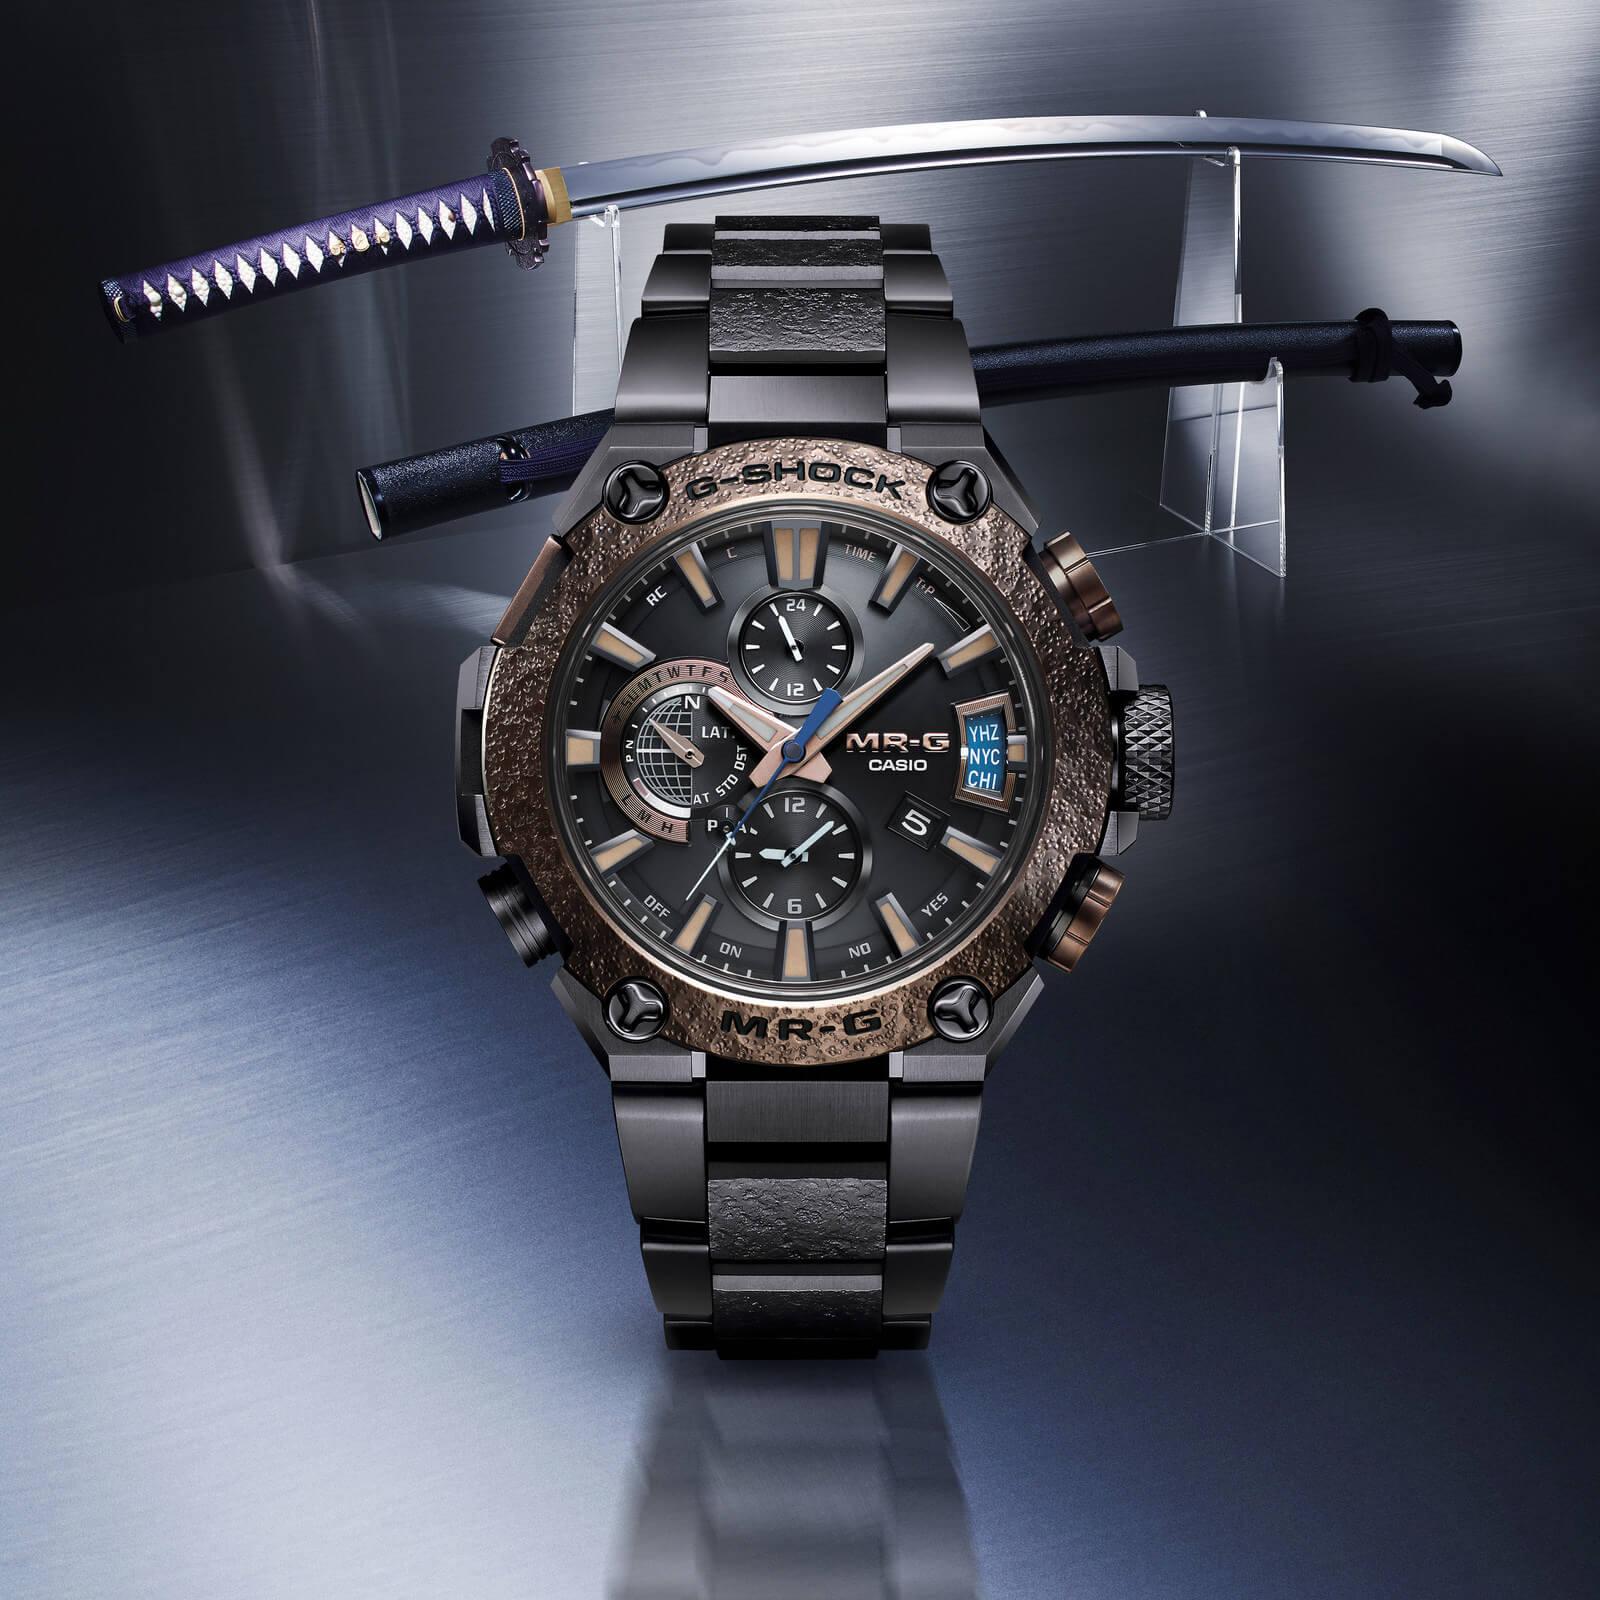 G Shock Mrg G2000ha 1a Limited Edition For Baselworld 2018 G Central G Shock Watch Fan Blog